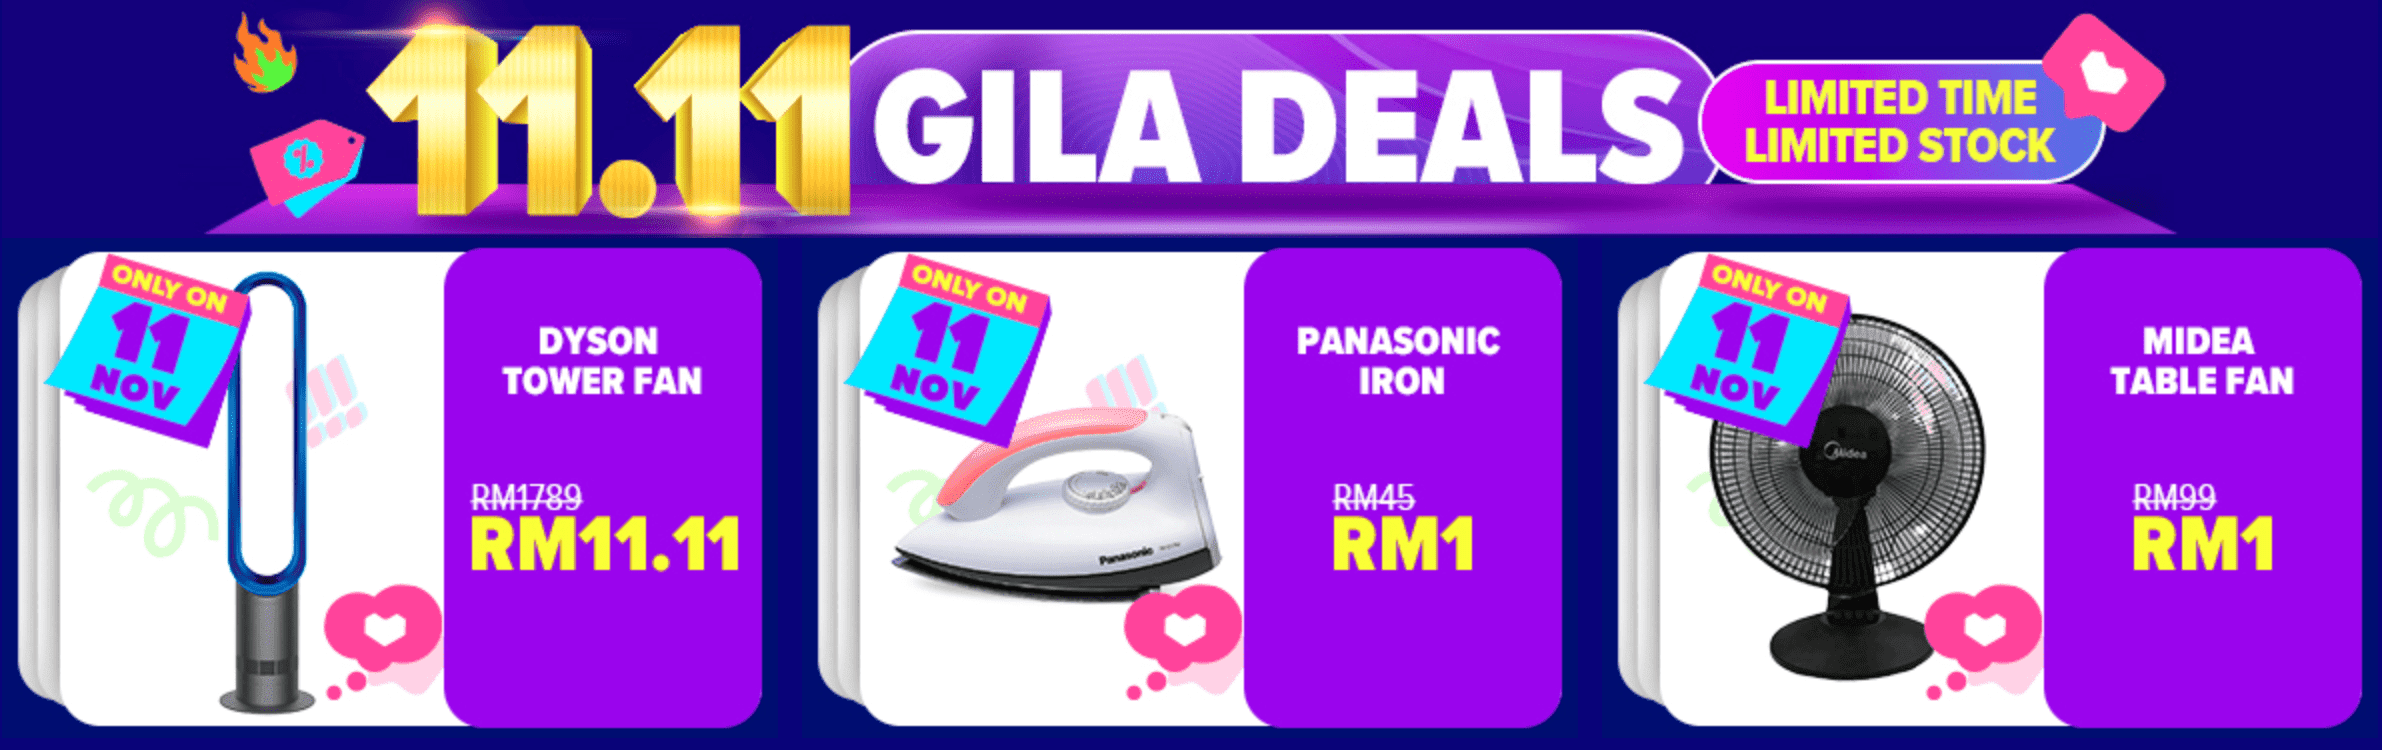 RM 1 Mestibeli deals lazada malaysia